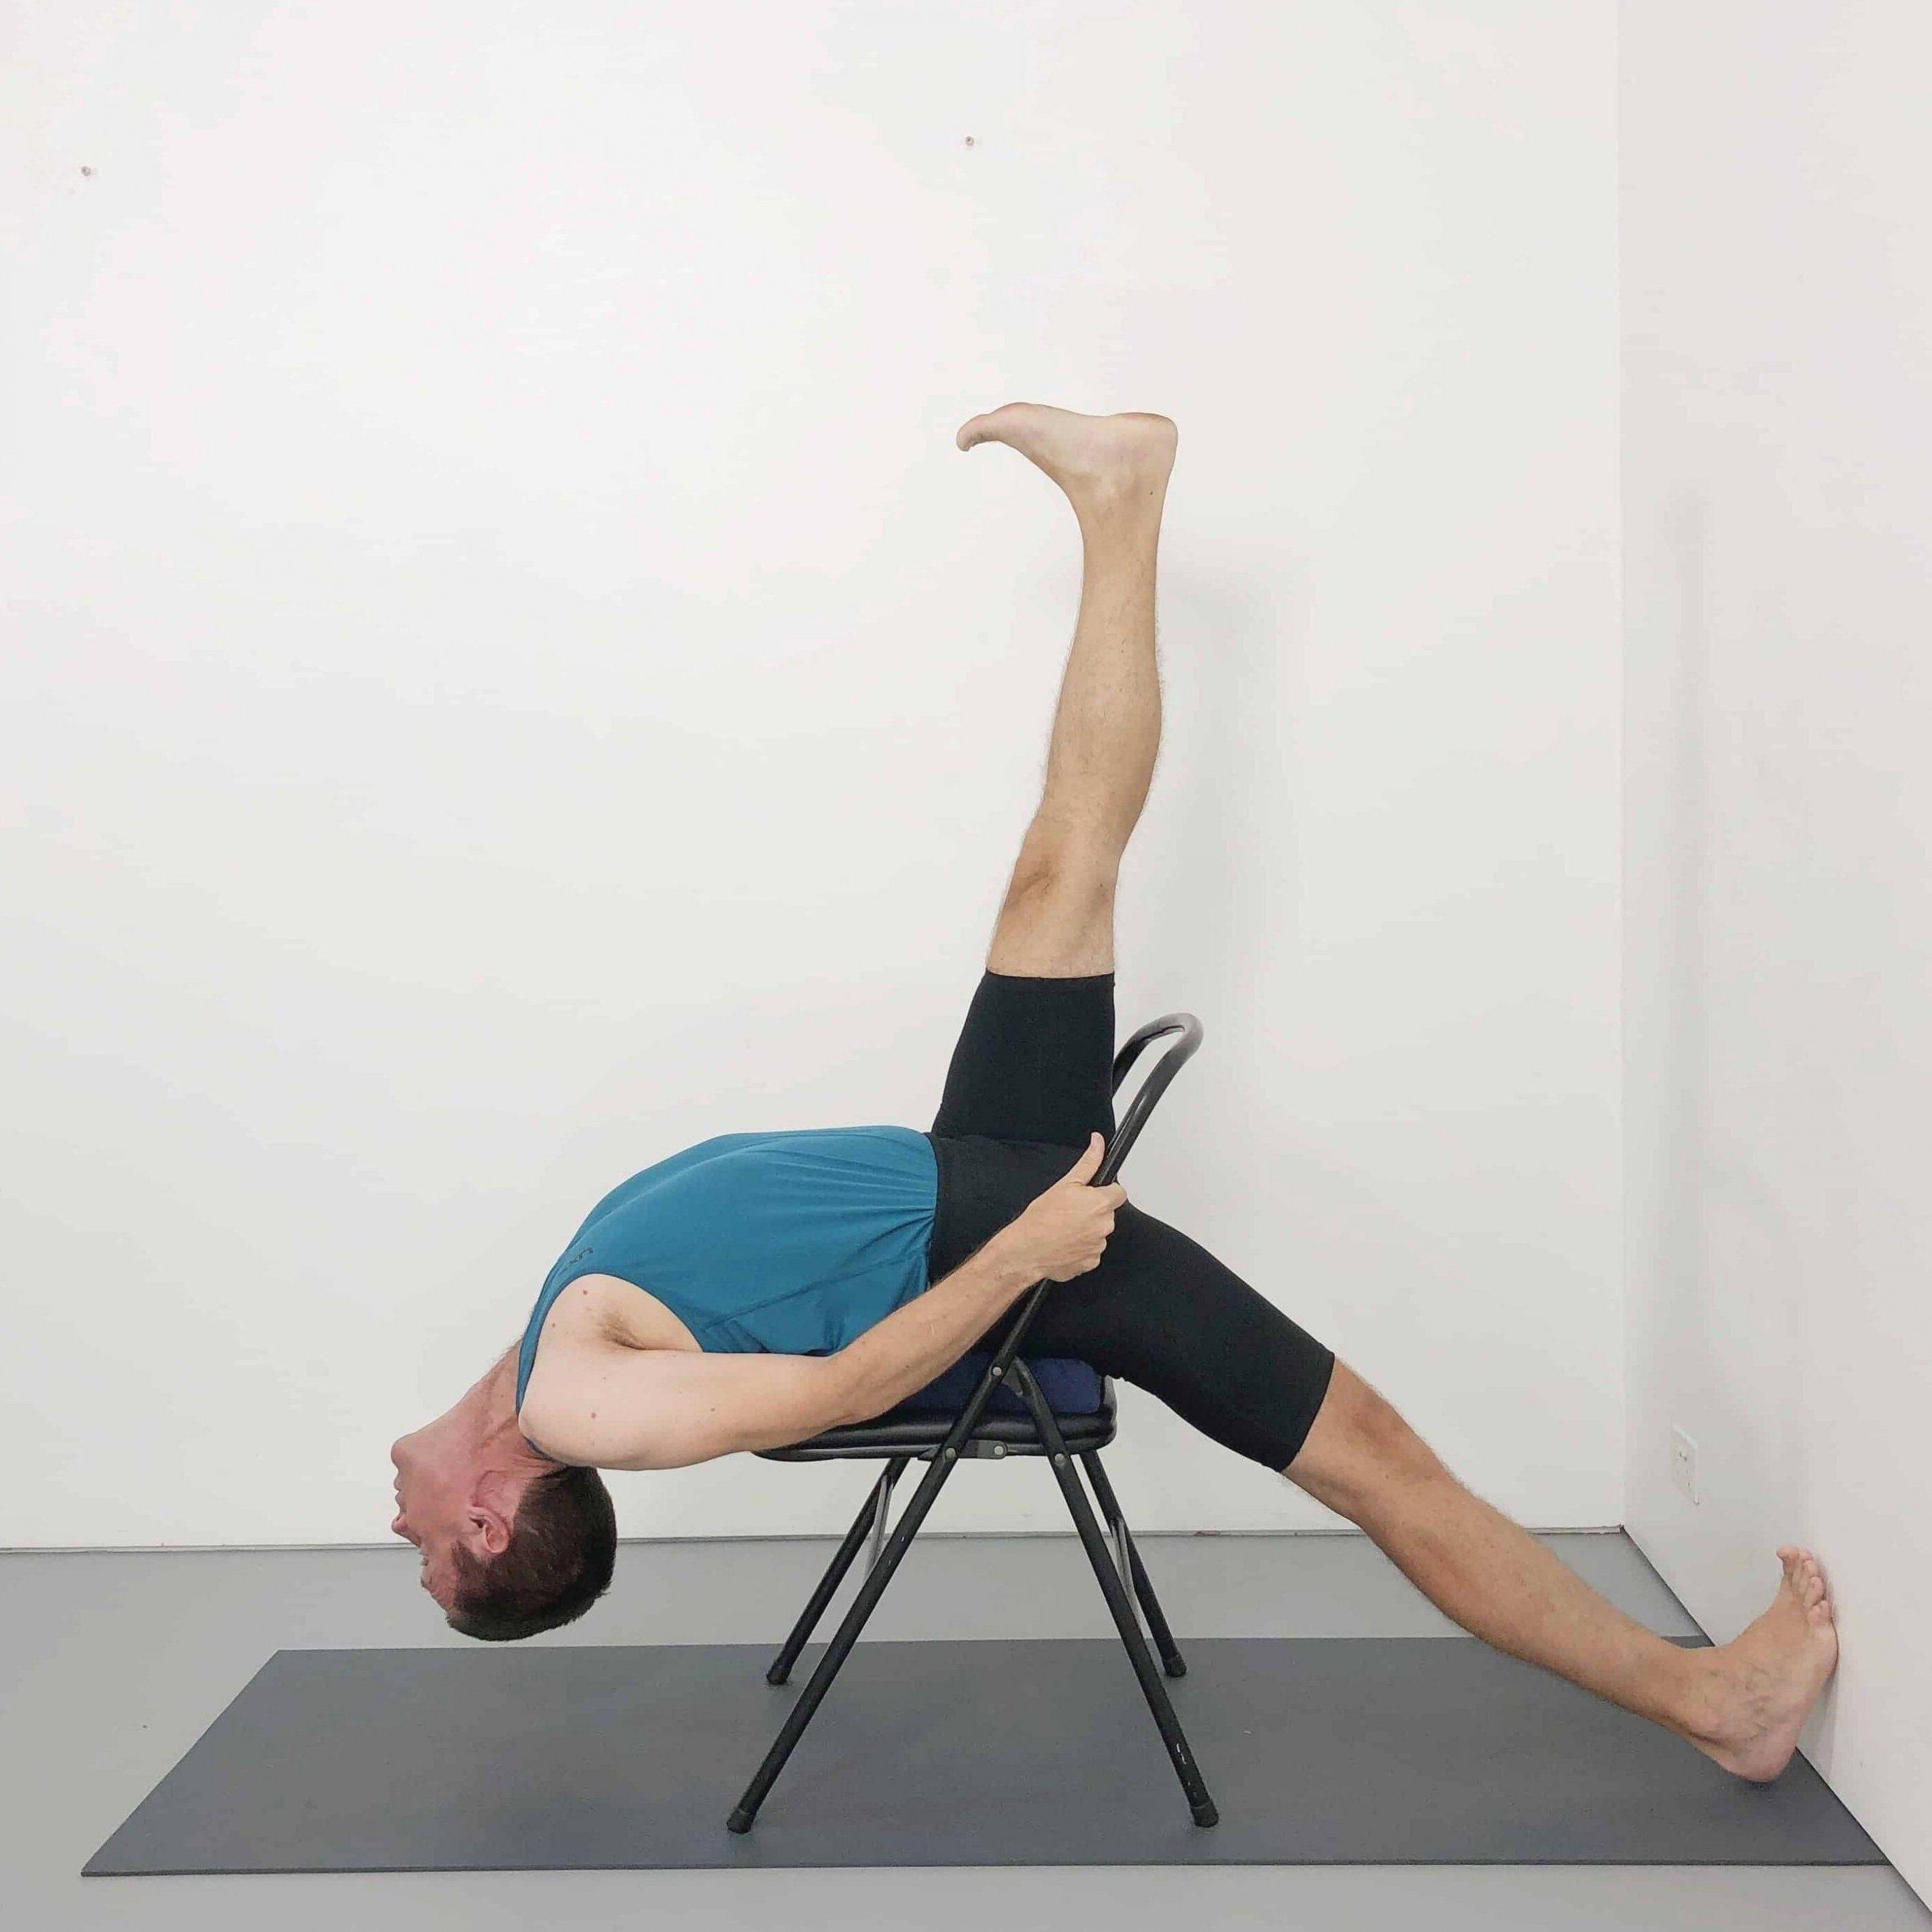 Iyengar Yoga Chair Backbends Yoga Selection In 2020 Iyengar Yoga Yoga Backbend Yoga Sequences